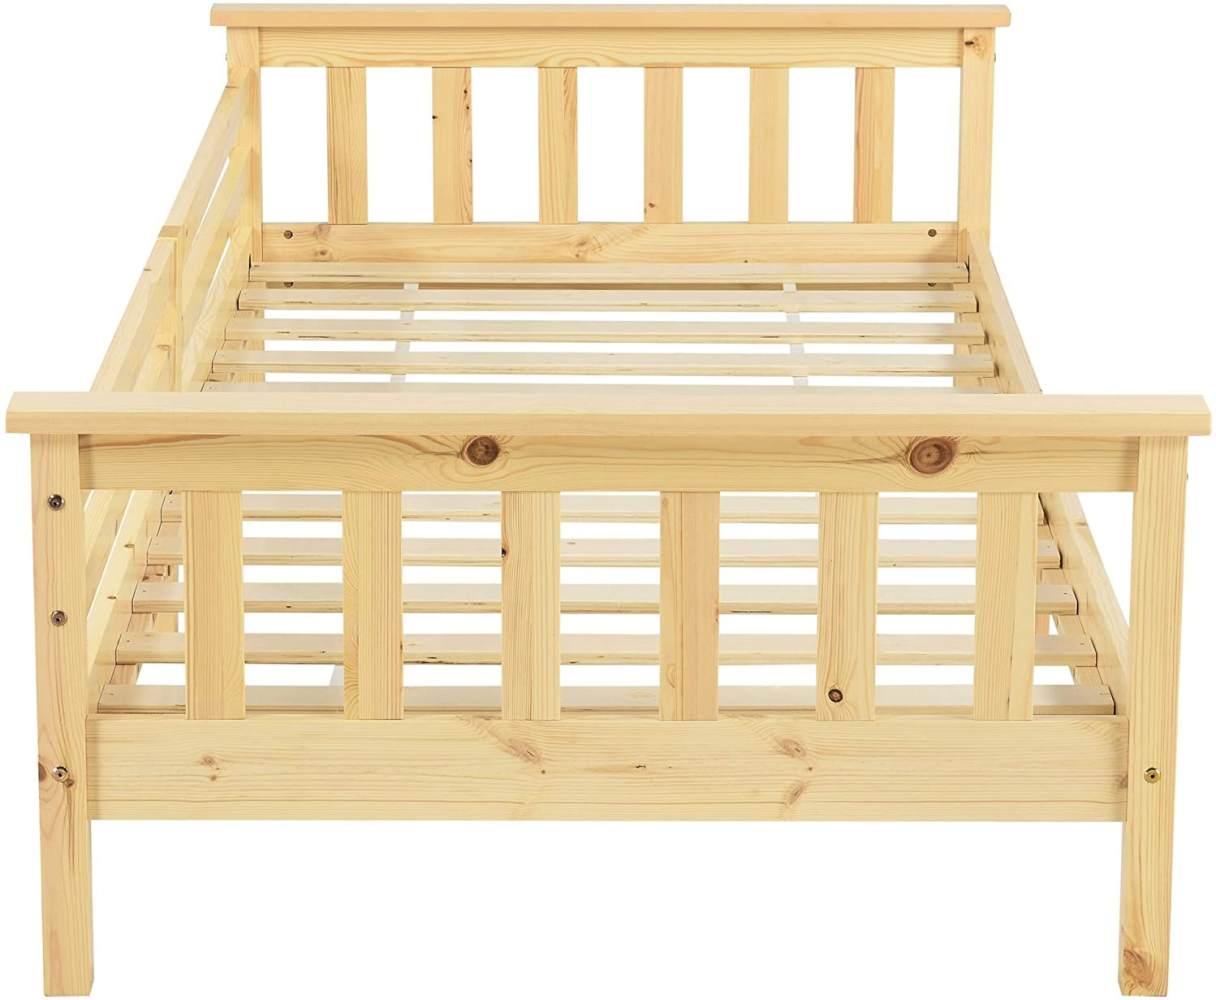 en.casa Kinderbett aus Kiefernholz mit Rausfallschutz 90x200 cm inkl. Lattenrost, natur Bild 1